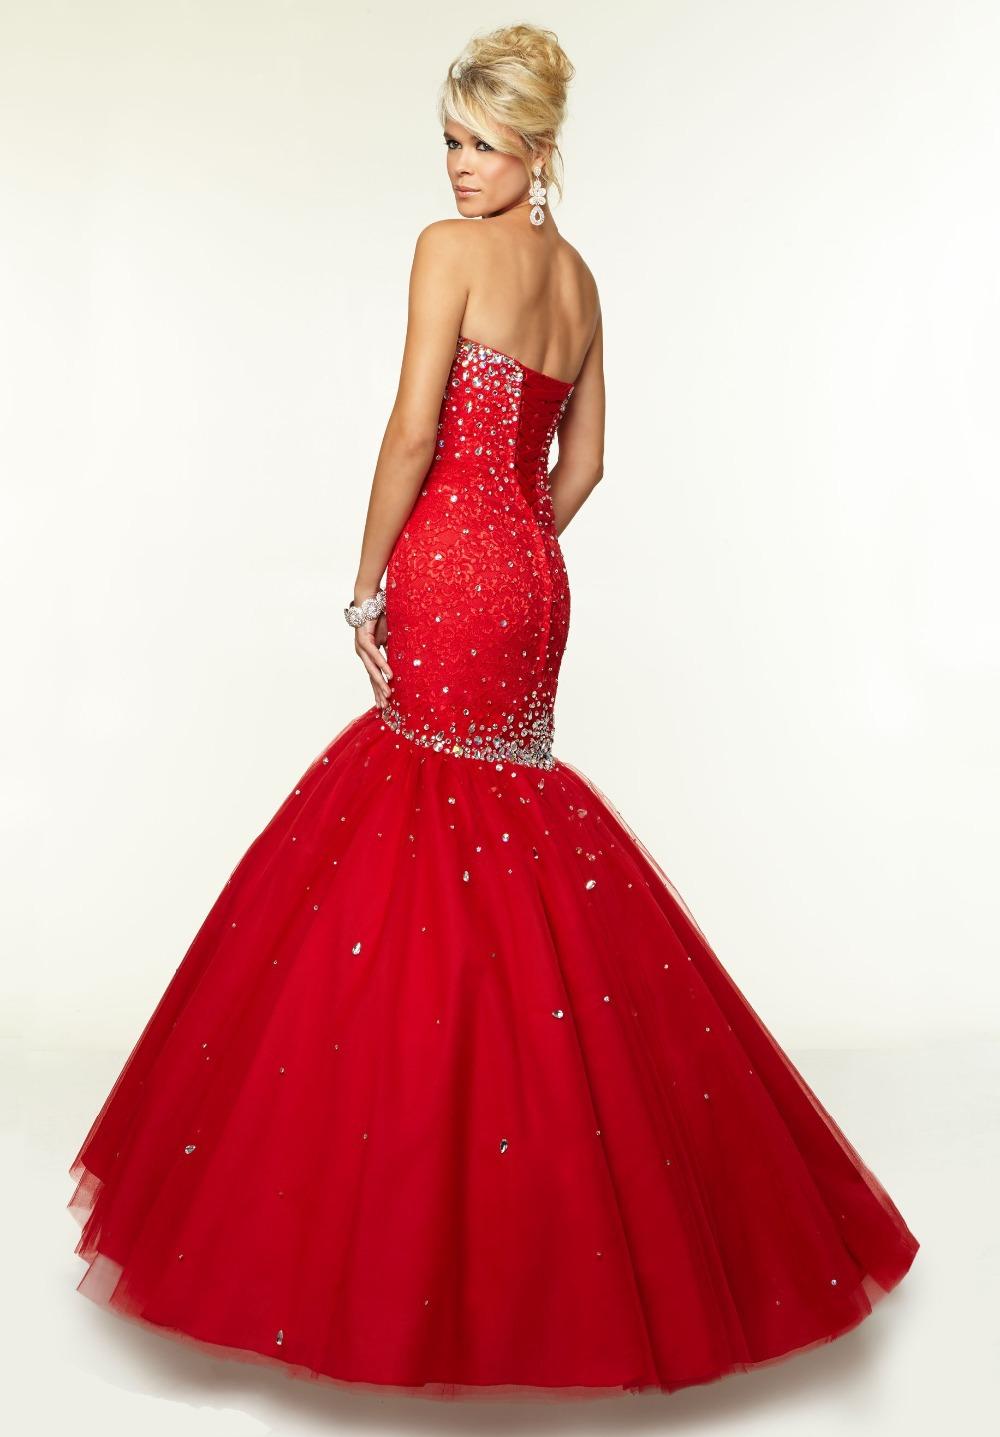 Red Sweetheart Neckline Prom Dress - Ocodea.com